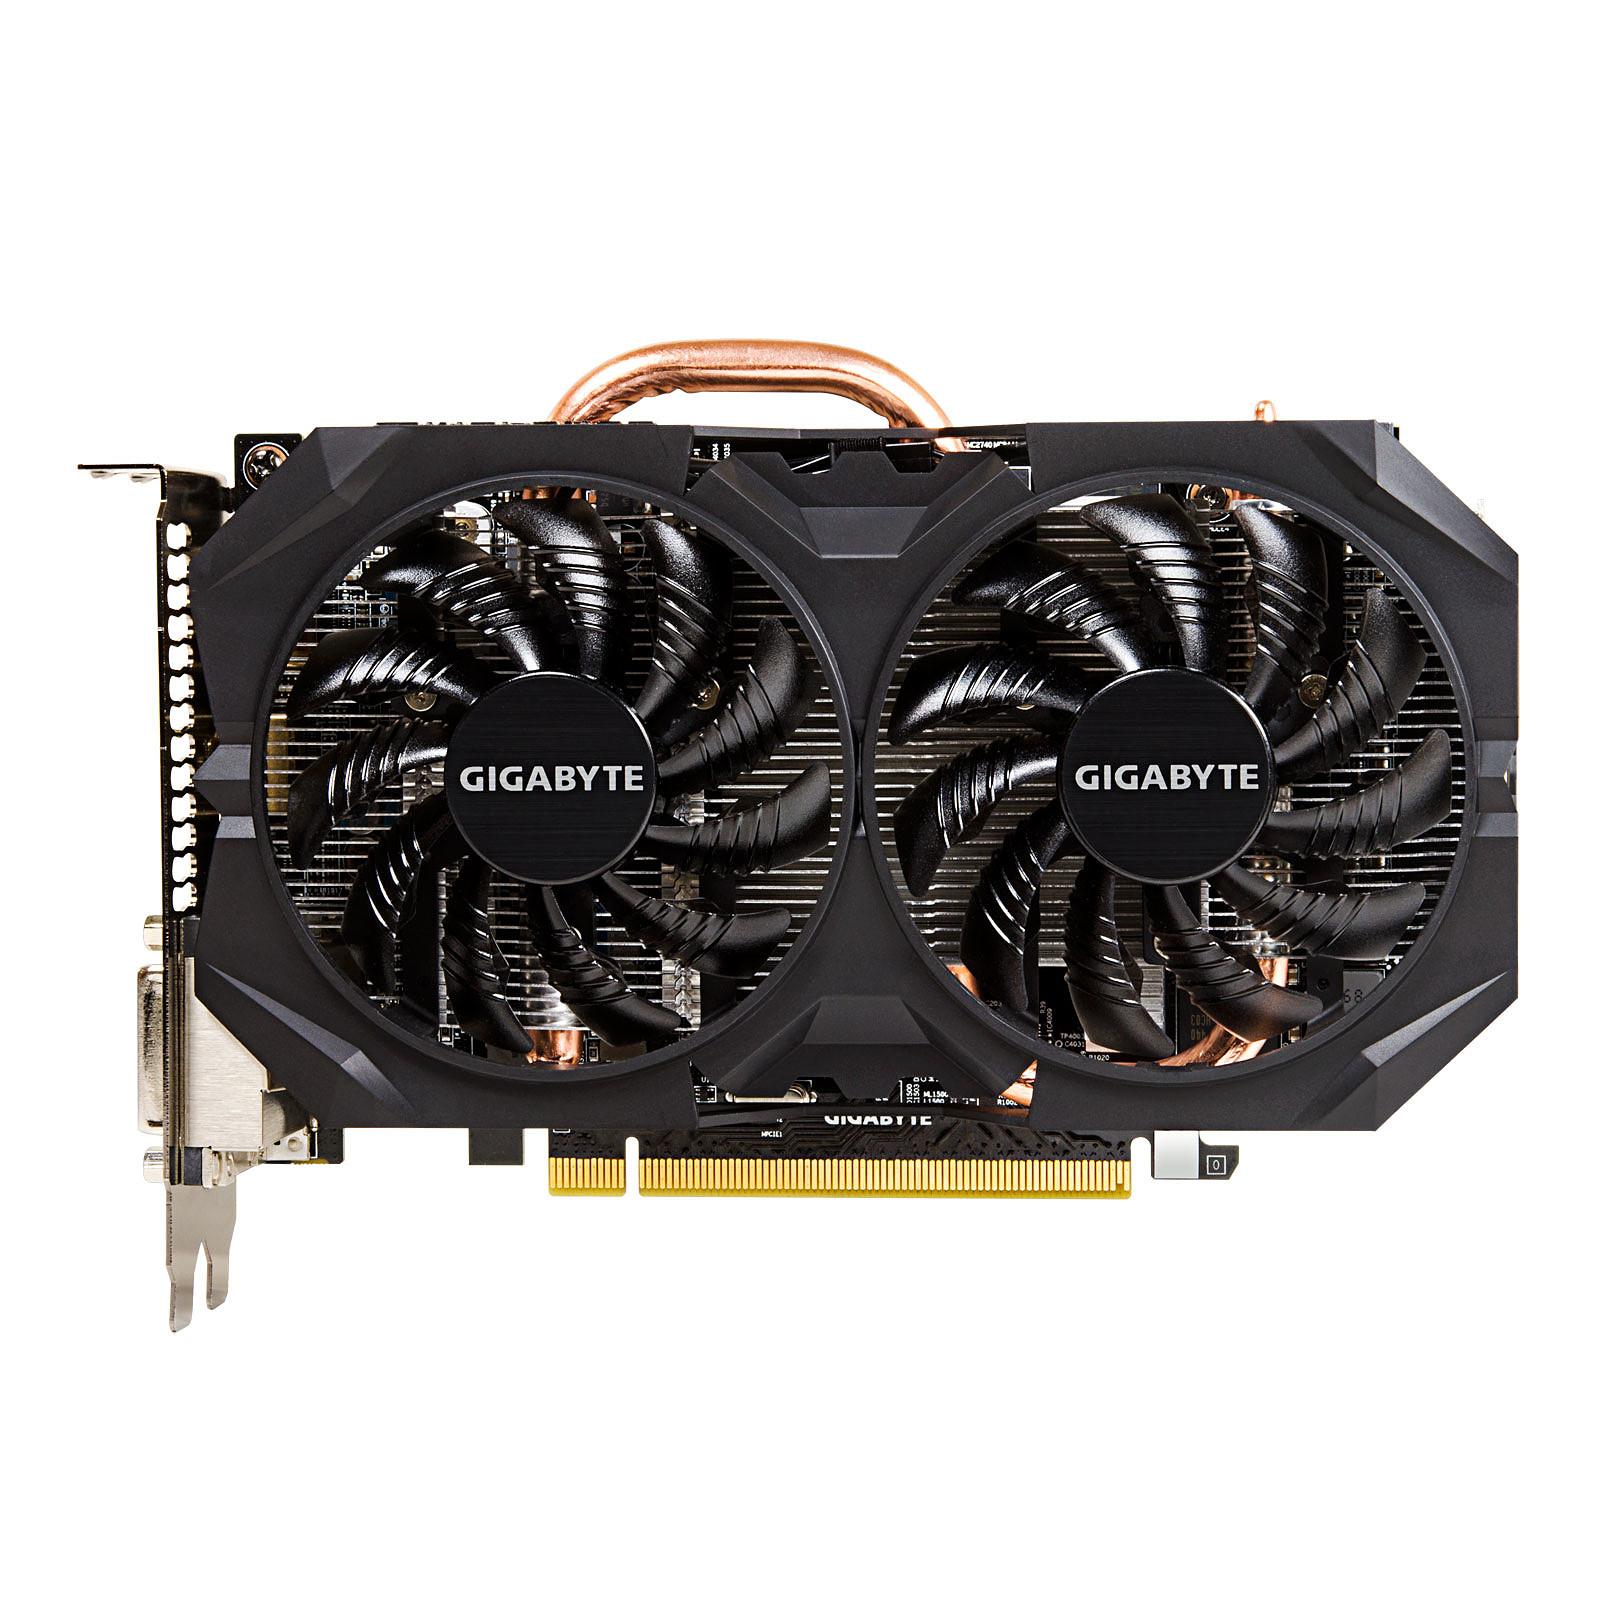 Gigabyte Radeon R7 370 GV-R737WF2OC-2GD